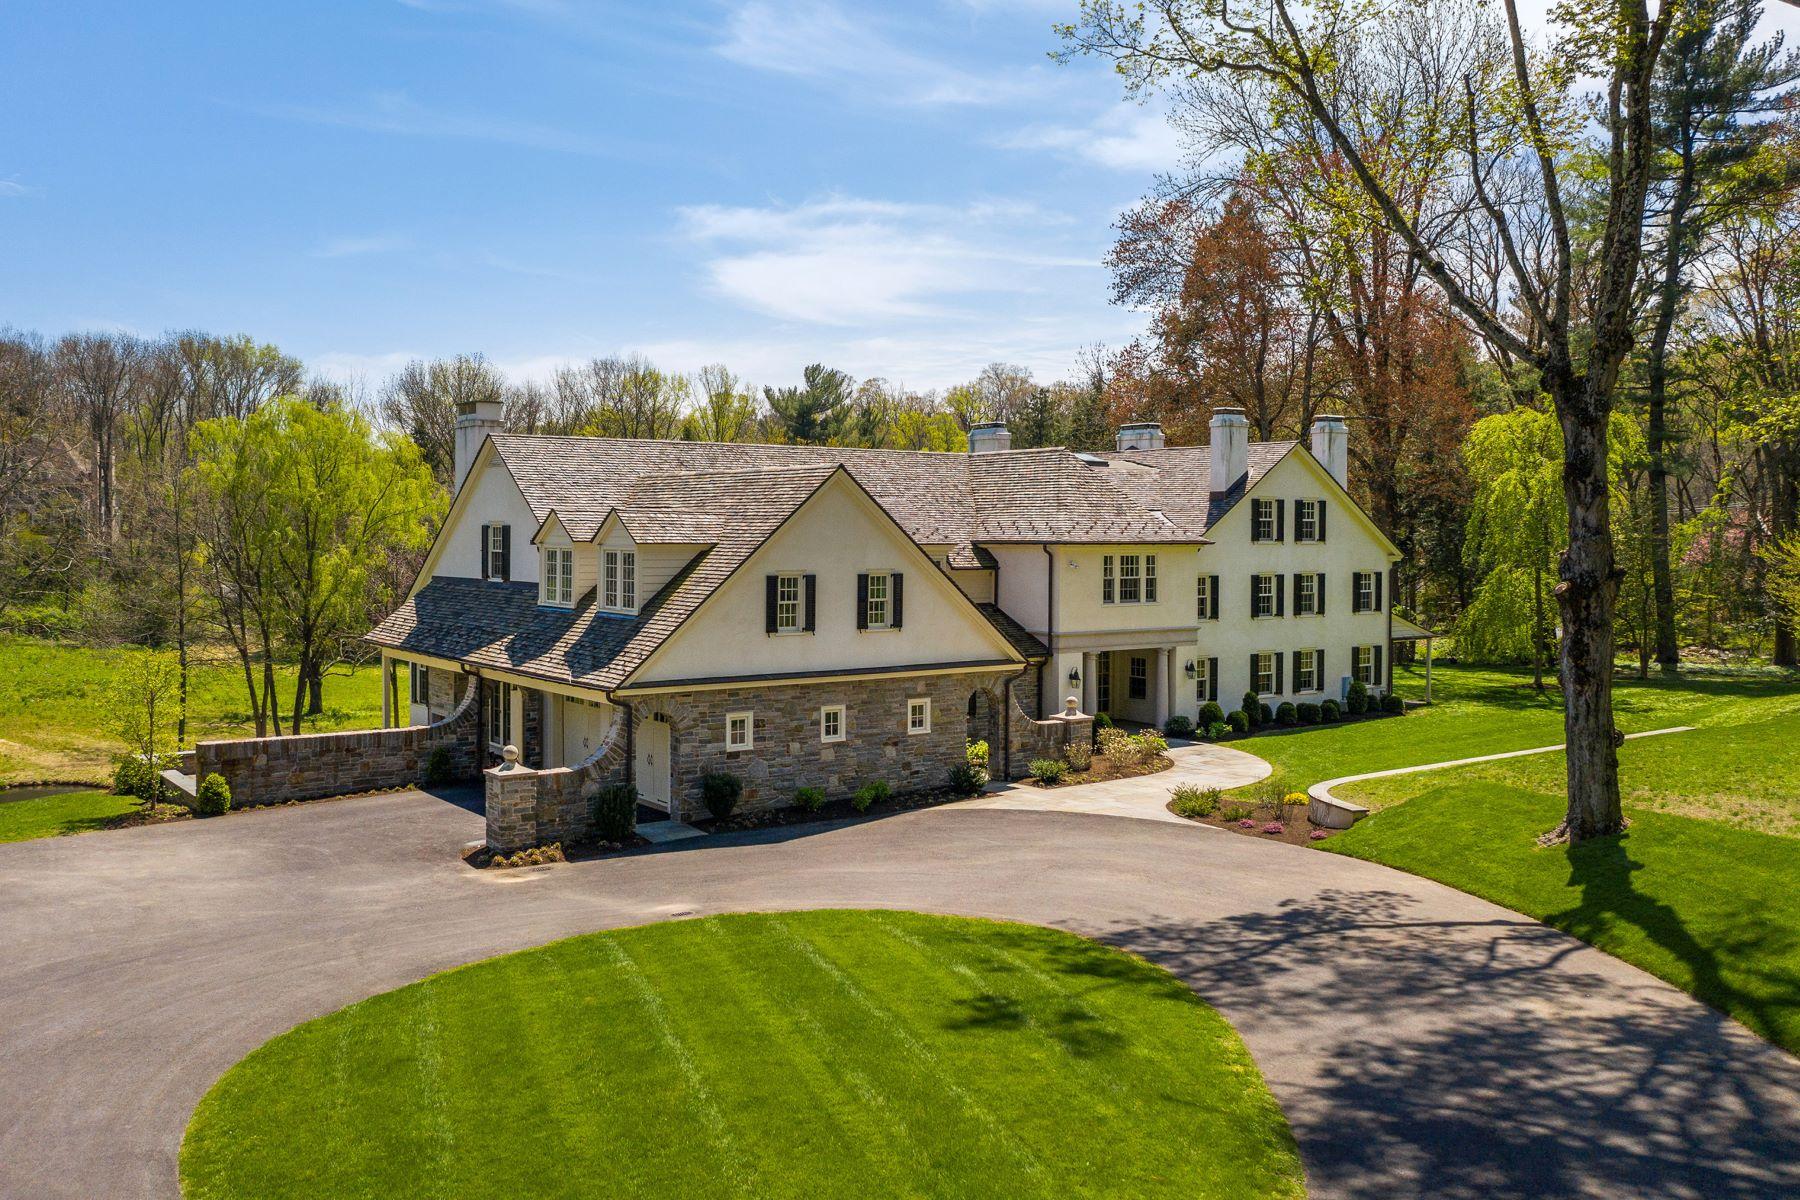 Single Family Homes for Sale at 739 DARBY PAOLI RD Villanova, Pennsylvania 19085 United States